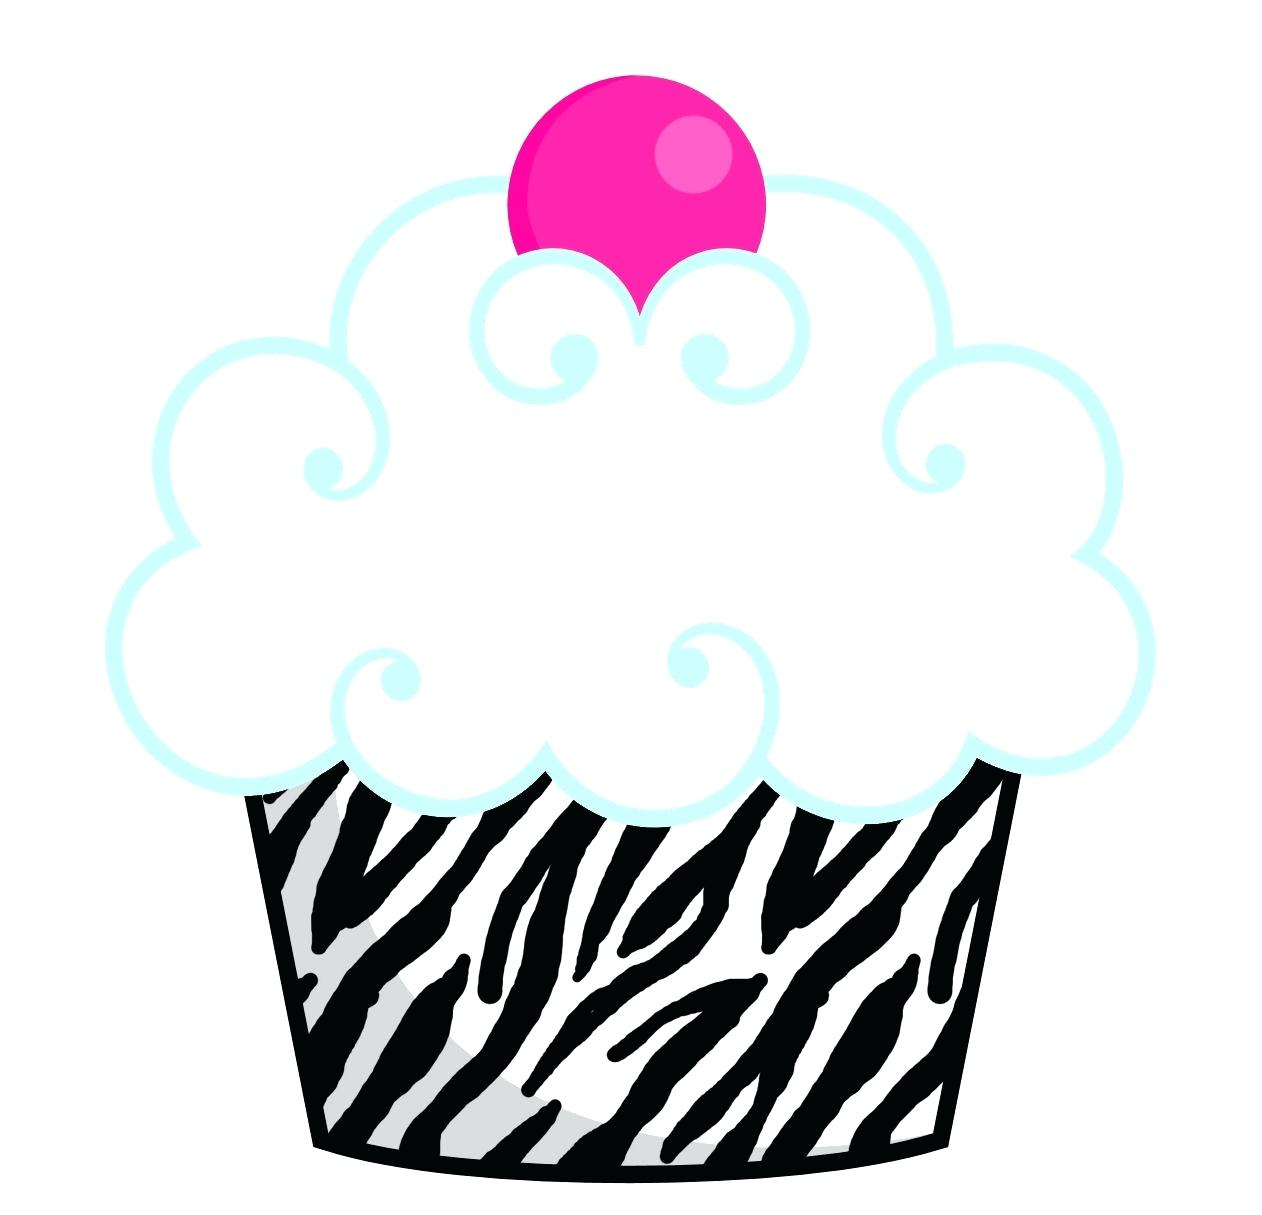 1262x1215 Printable Printable Cupcake Clip Art Black And White Cute